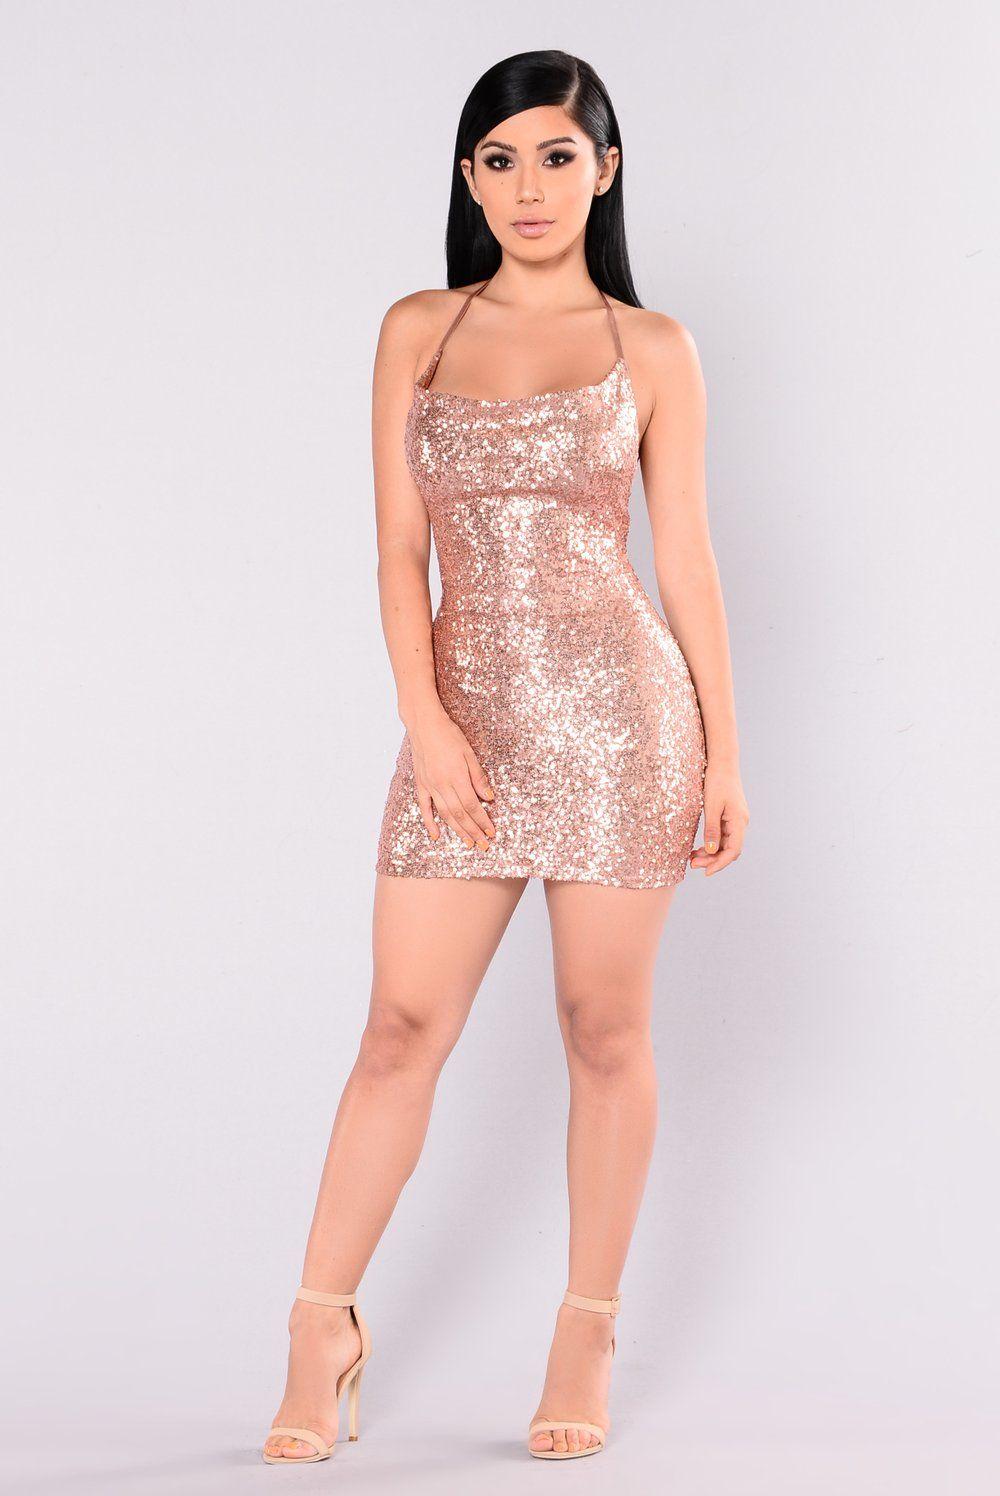 Start The Show Sequin Dress Rose Gold Gold Dress Short Sequin Dress Short Rose Gold Dress Short